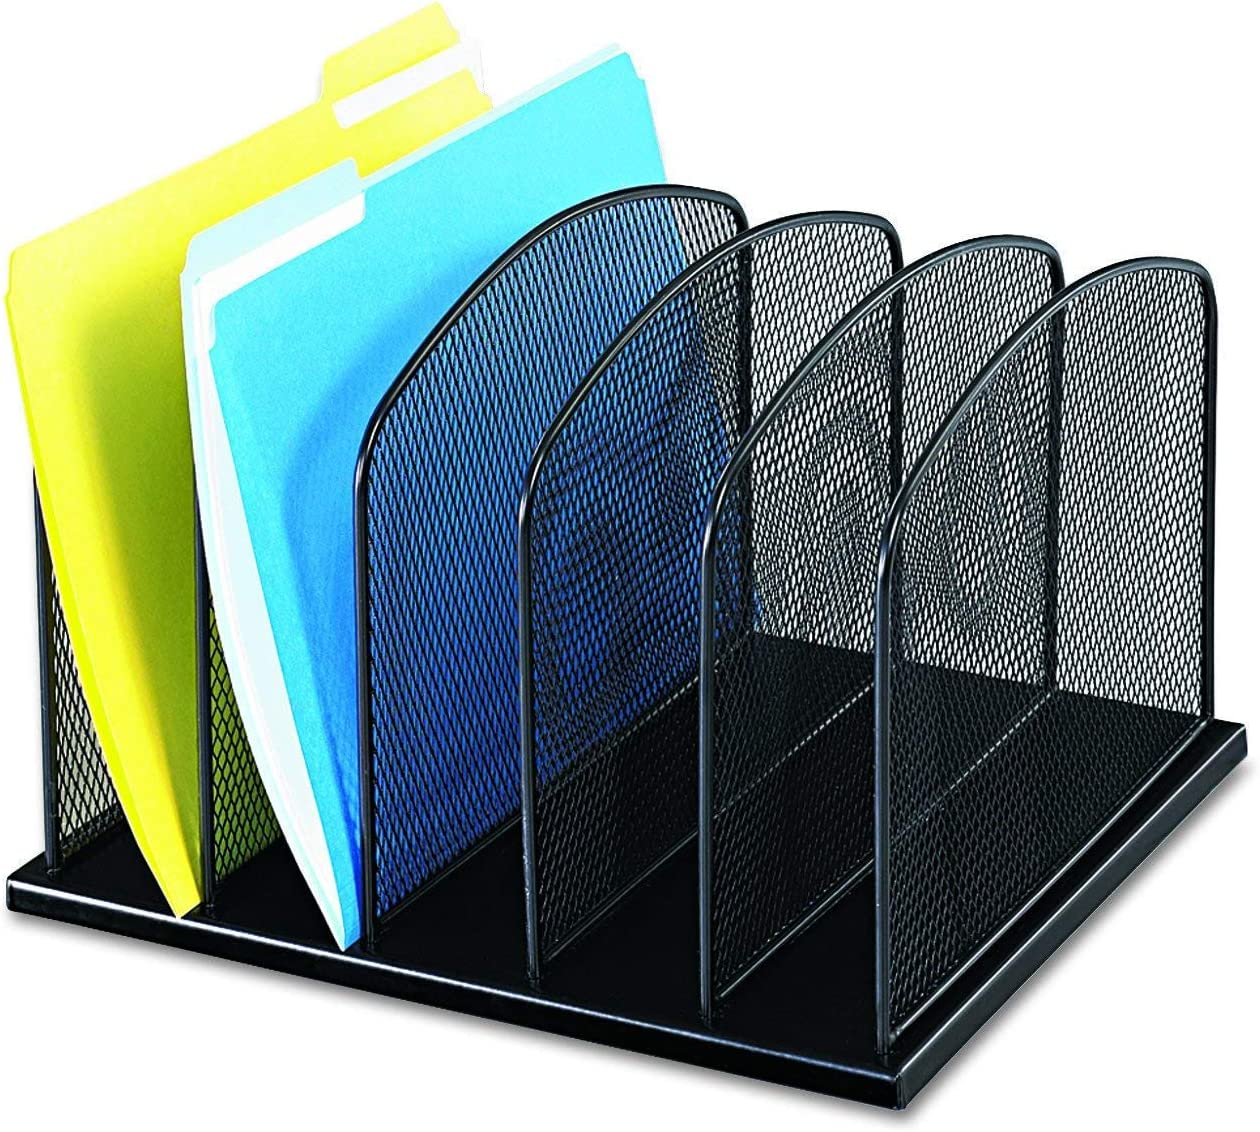 Durable Steel Mesh Construction Black Powder Coat Finish Renewed Safco Products Onyx Mesh 5 Sort Vertical Desktop Organizer 3256BL